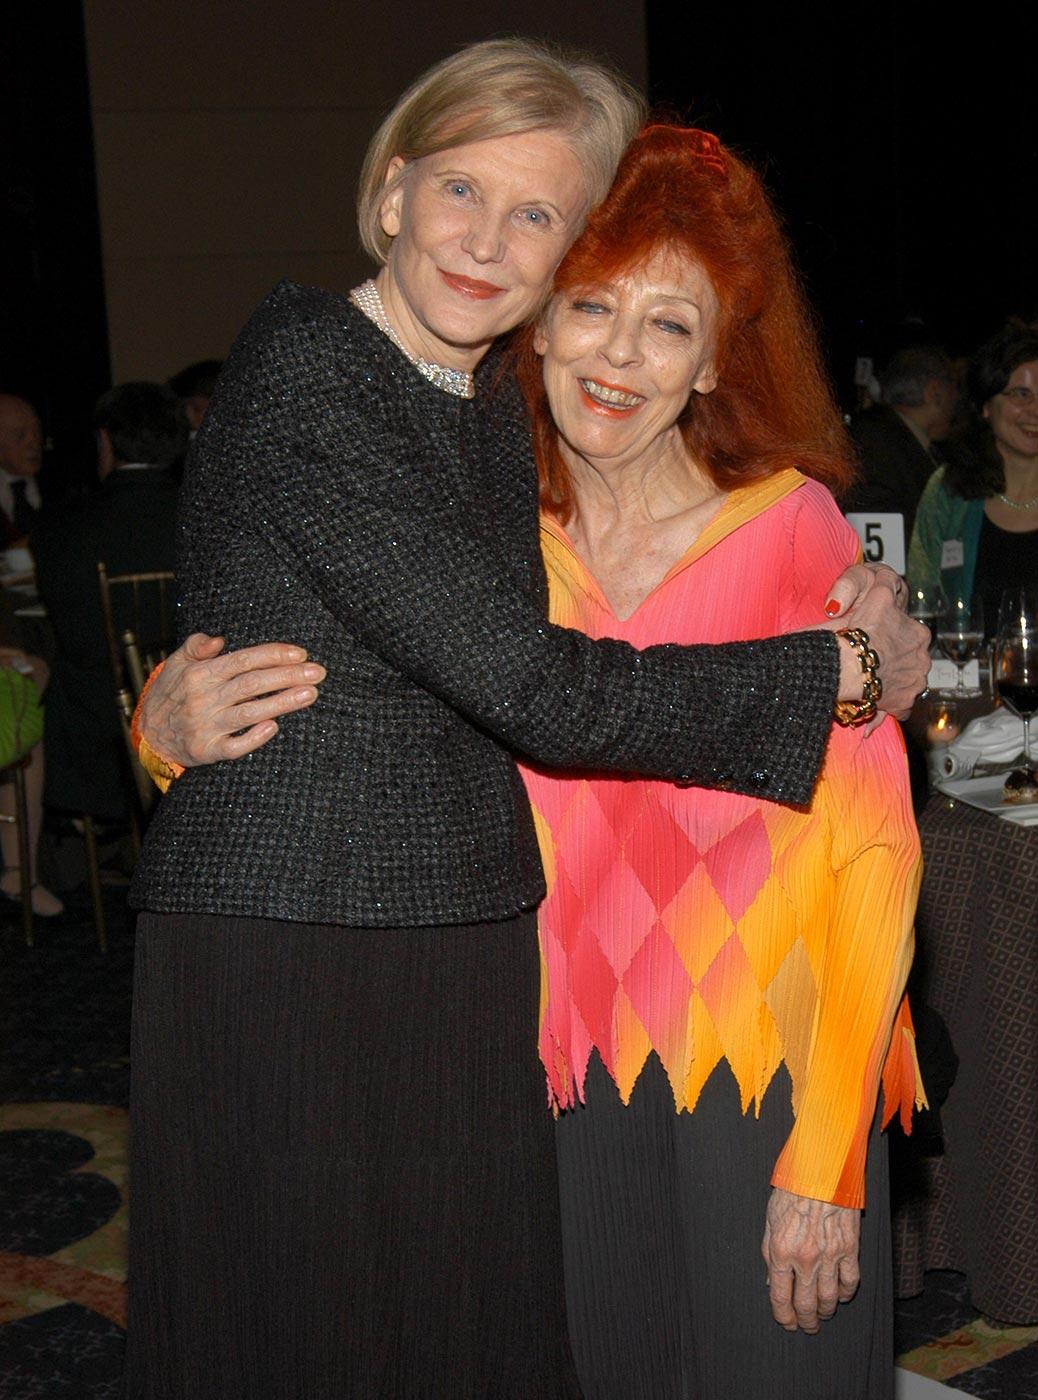 Marica Vilcek and Jeanne-Claude in an awards gala ballroom.